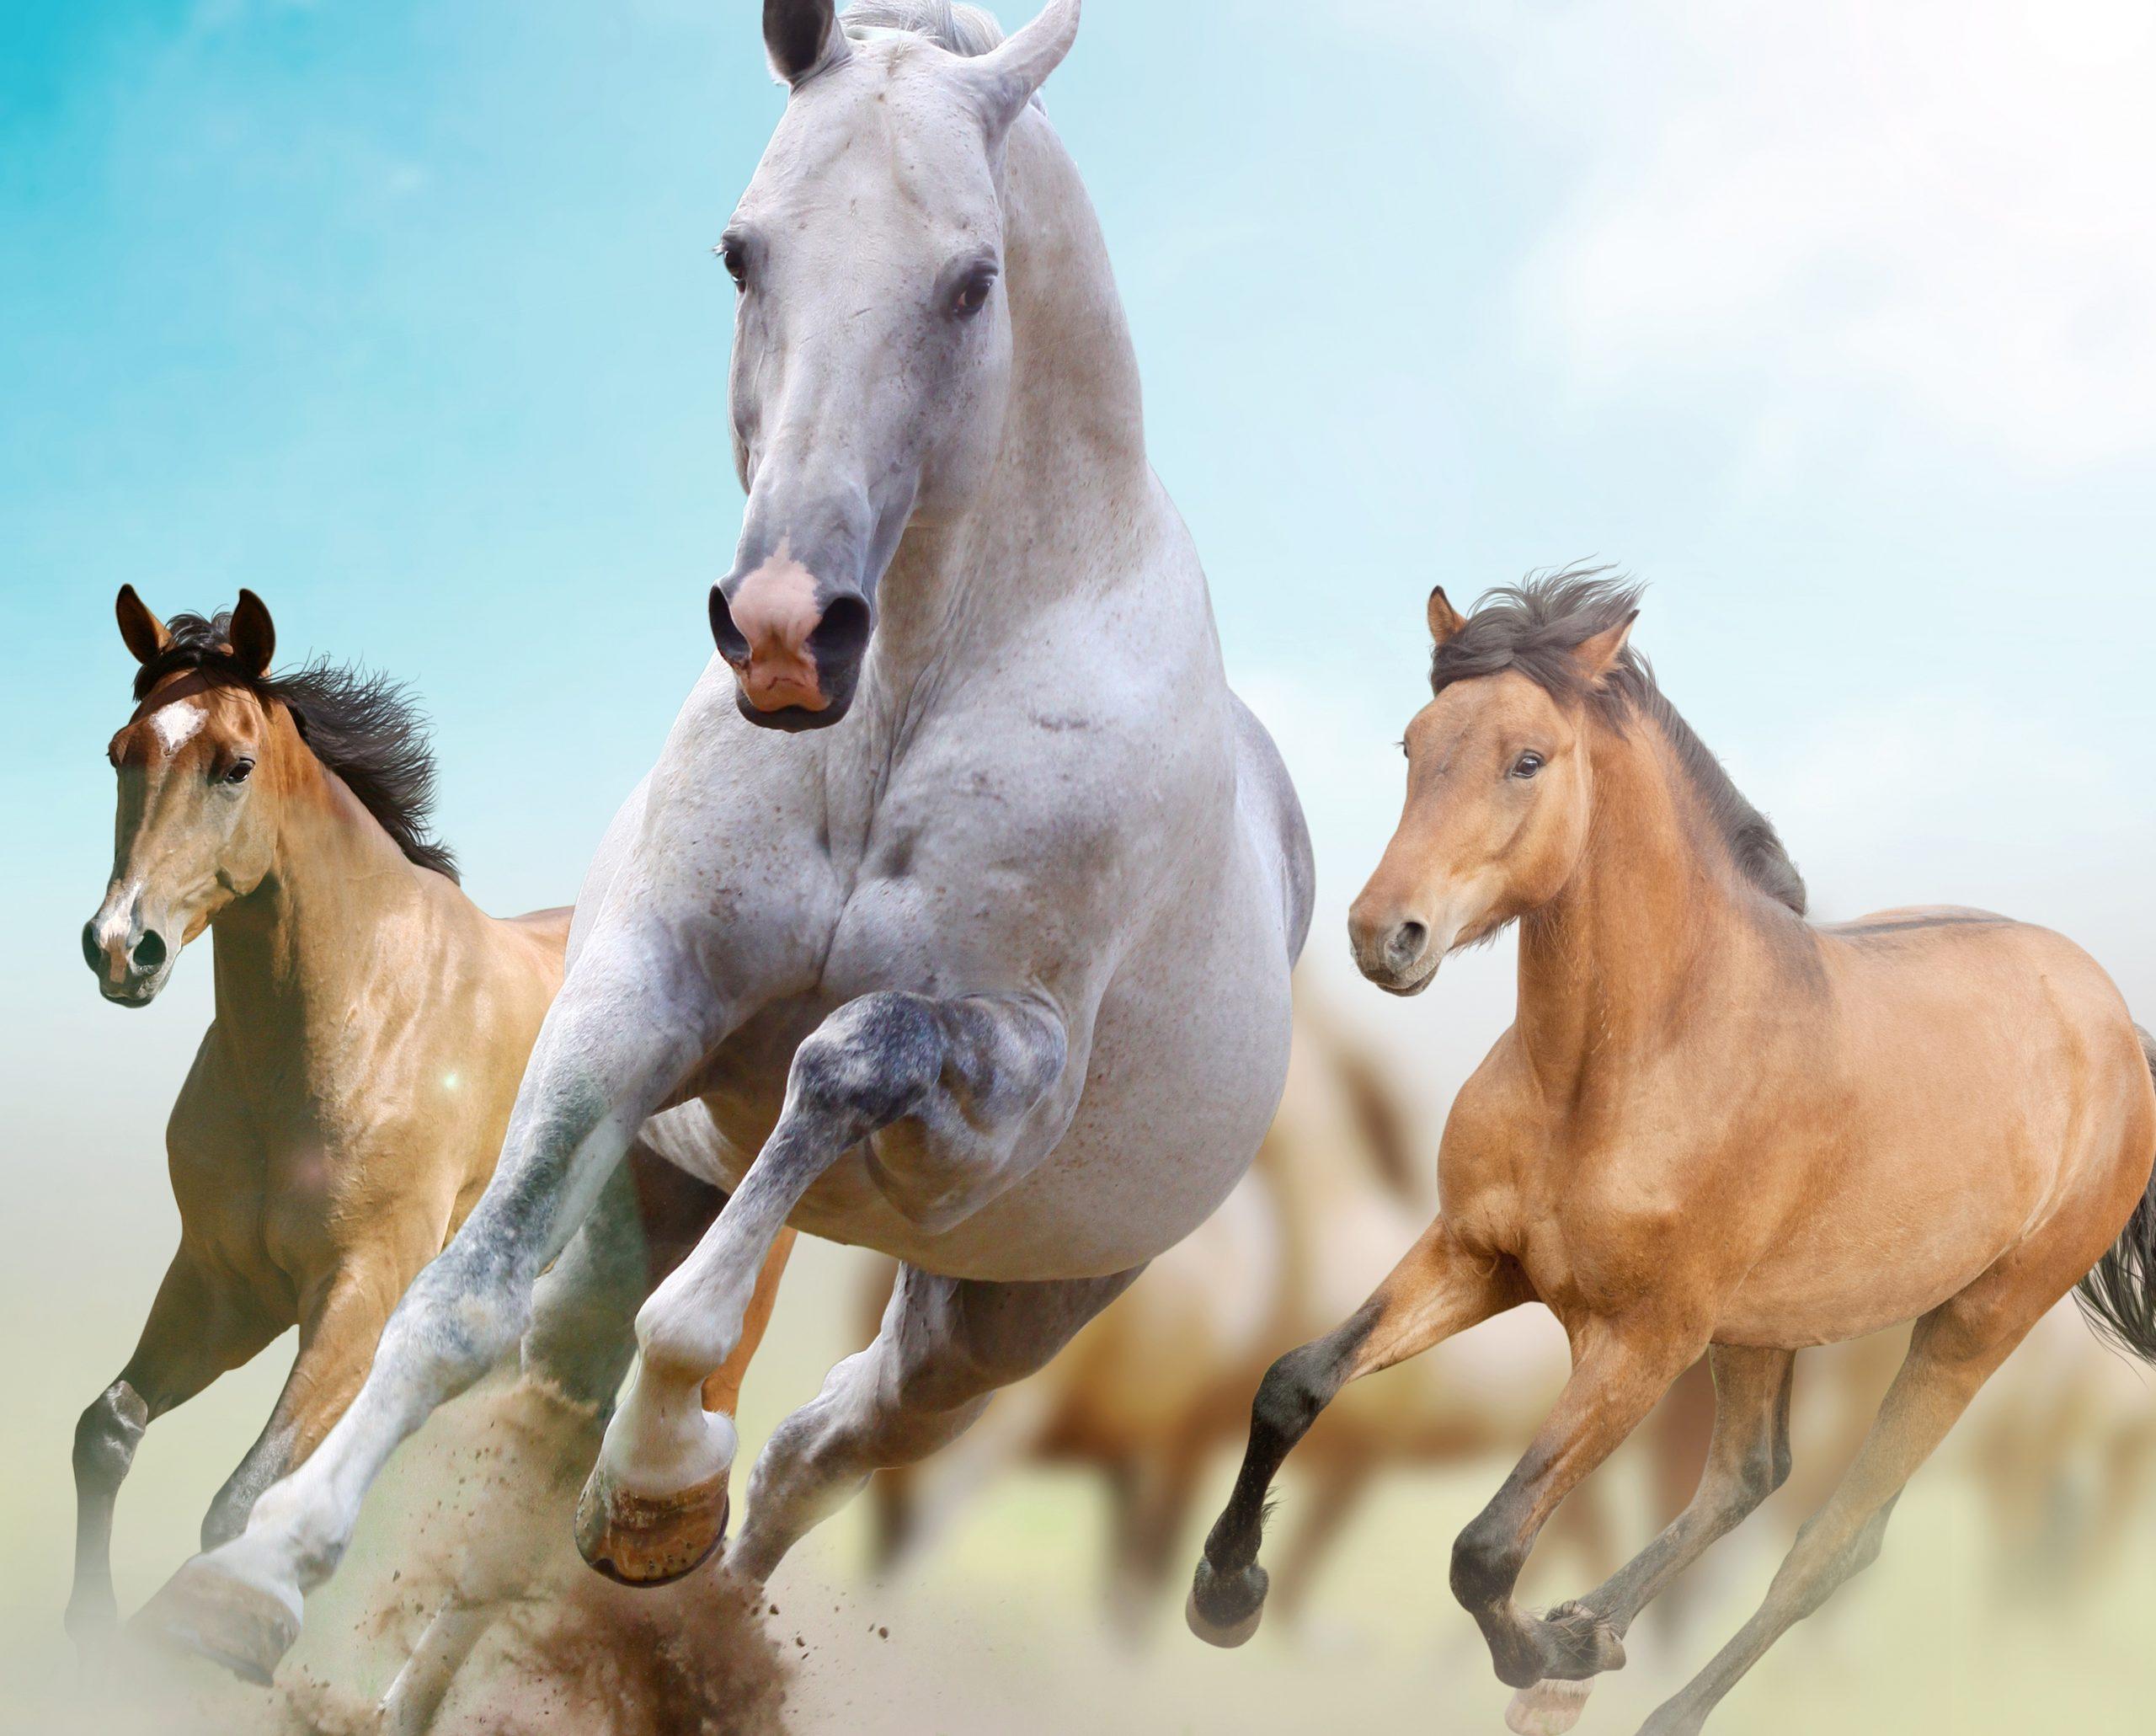 atlar-ayaklarini-neden-yere-vurur